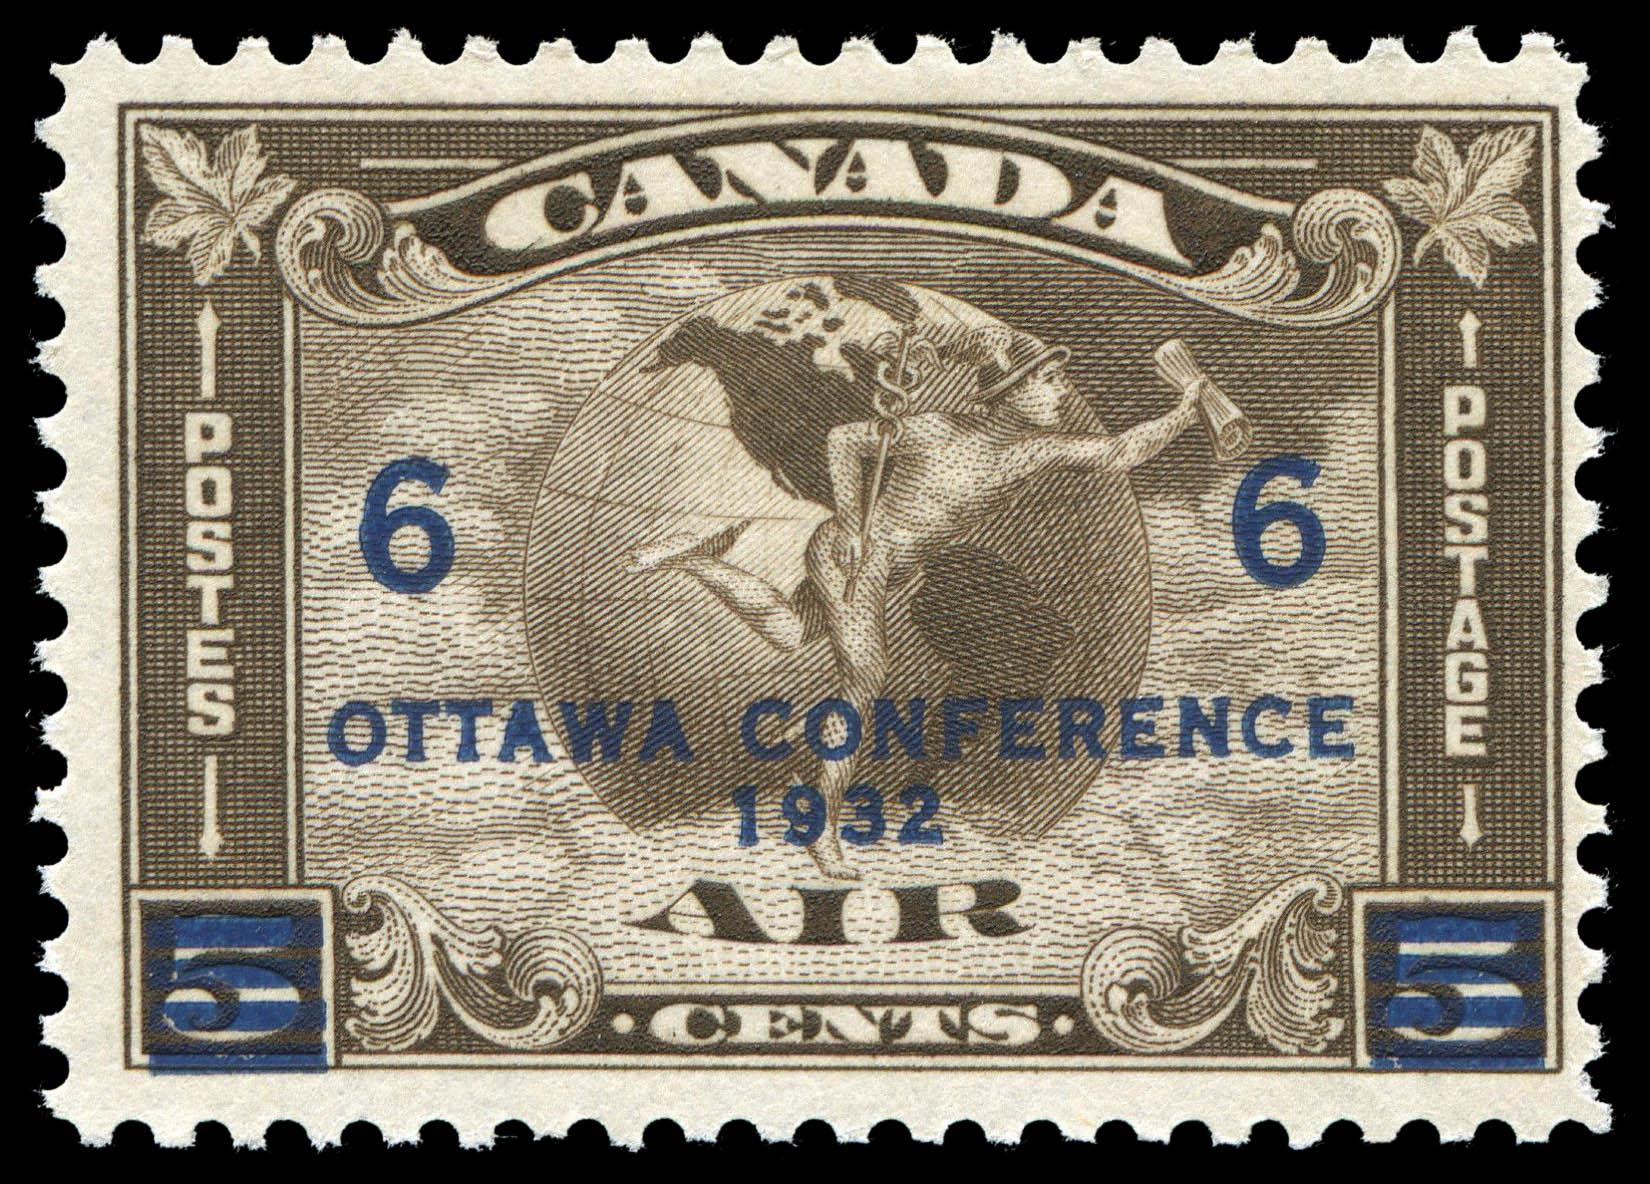 Air, Mercury Canada Postage Stamp